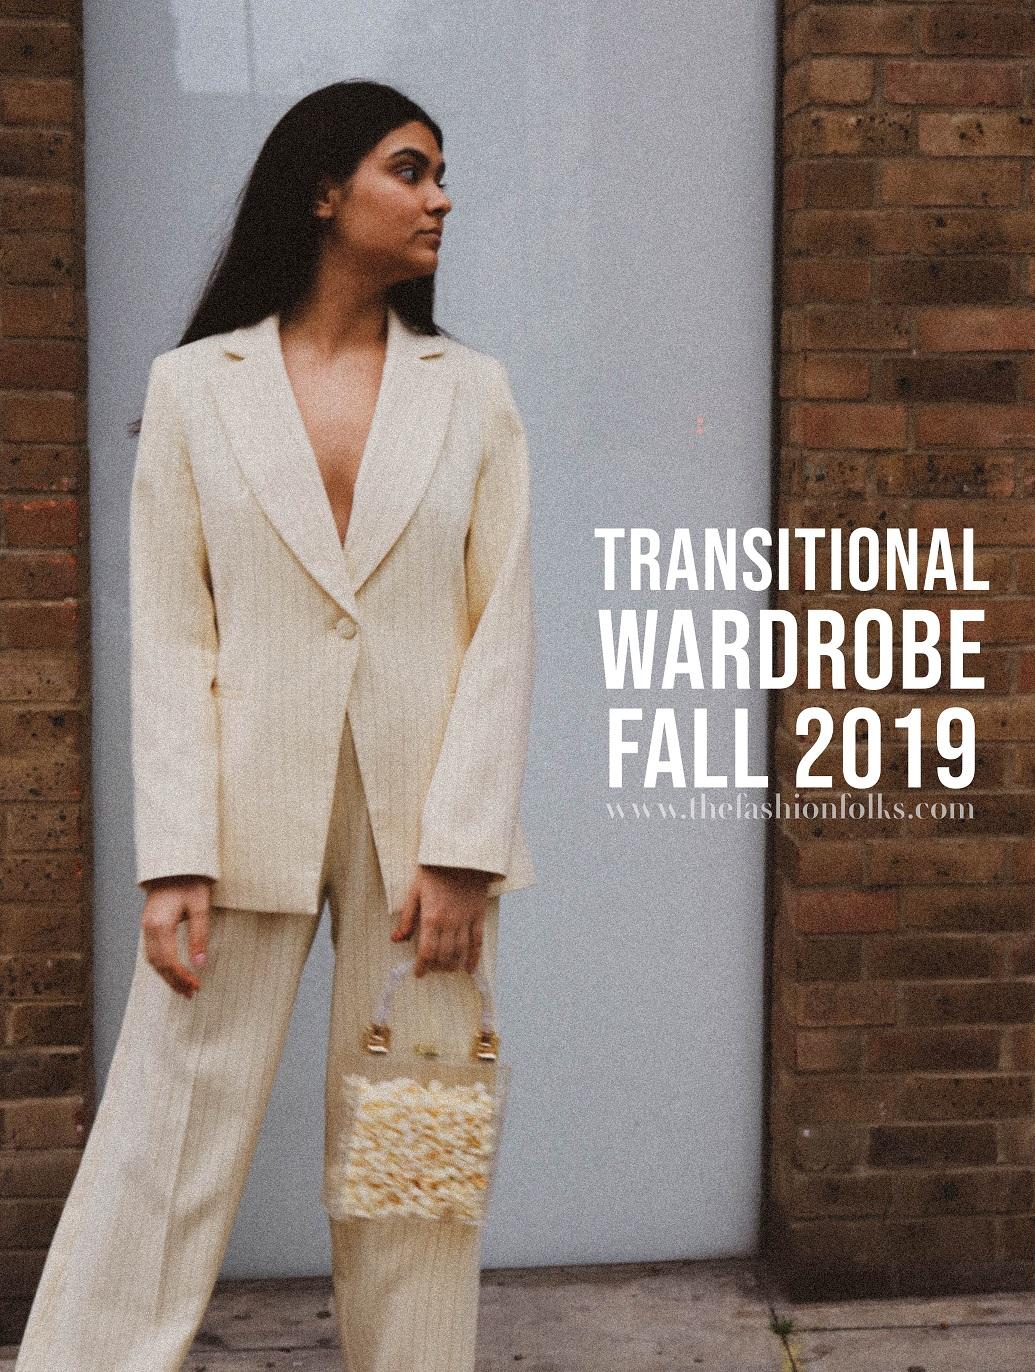 Transitional Wardrobe Fall 2019